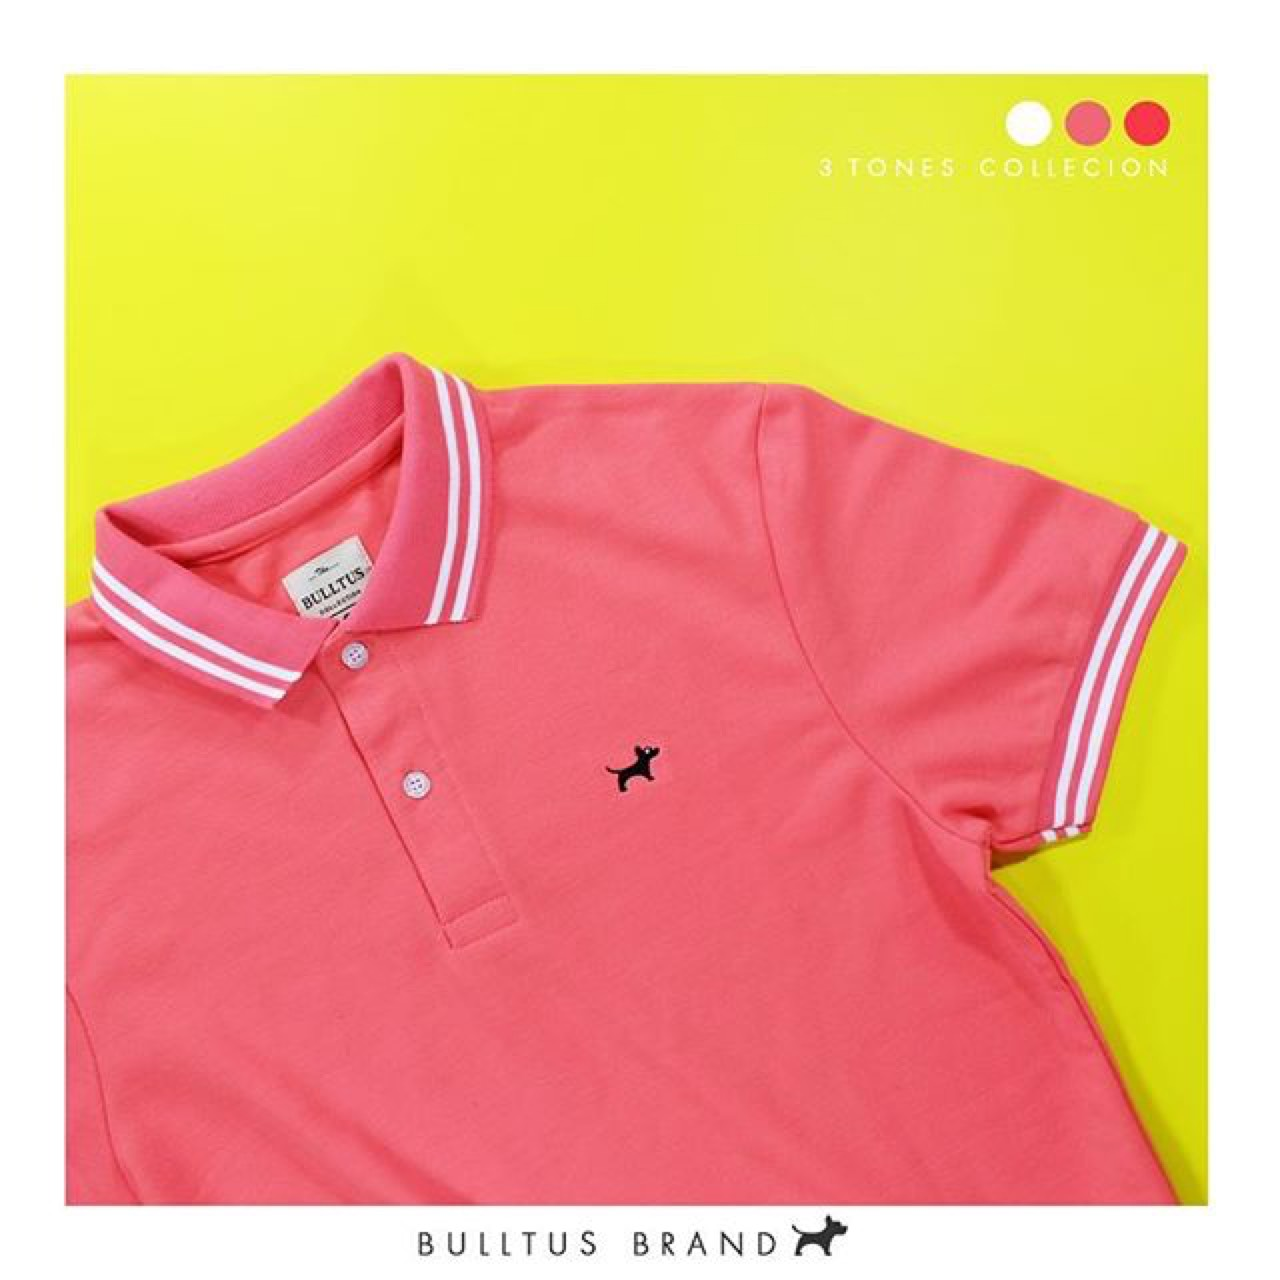 PinkColor,ลองเพิ่มสีสันด้วย,Polo,Poloshirt,Shirt,Bulltus,BulltusBrand,PoloBilltus